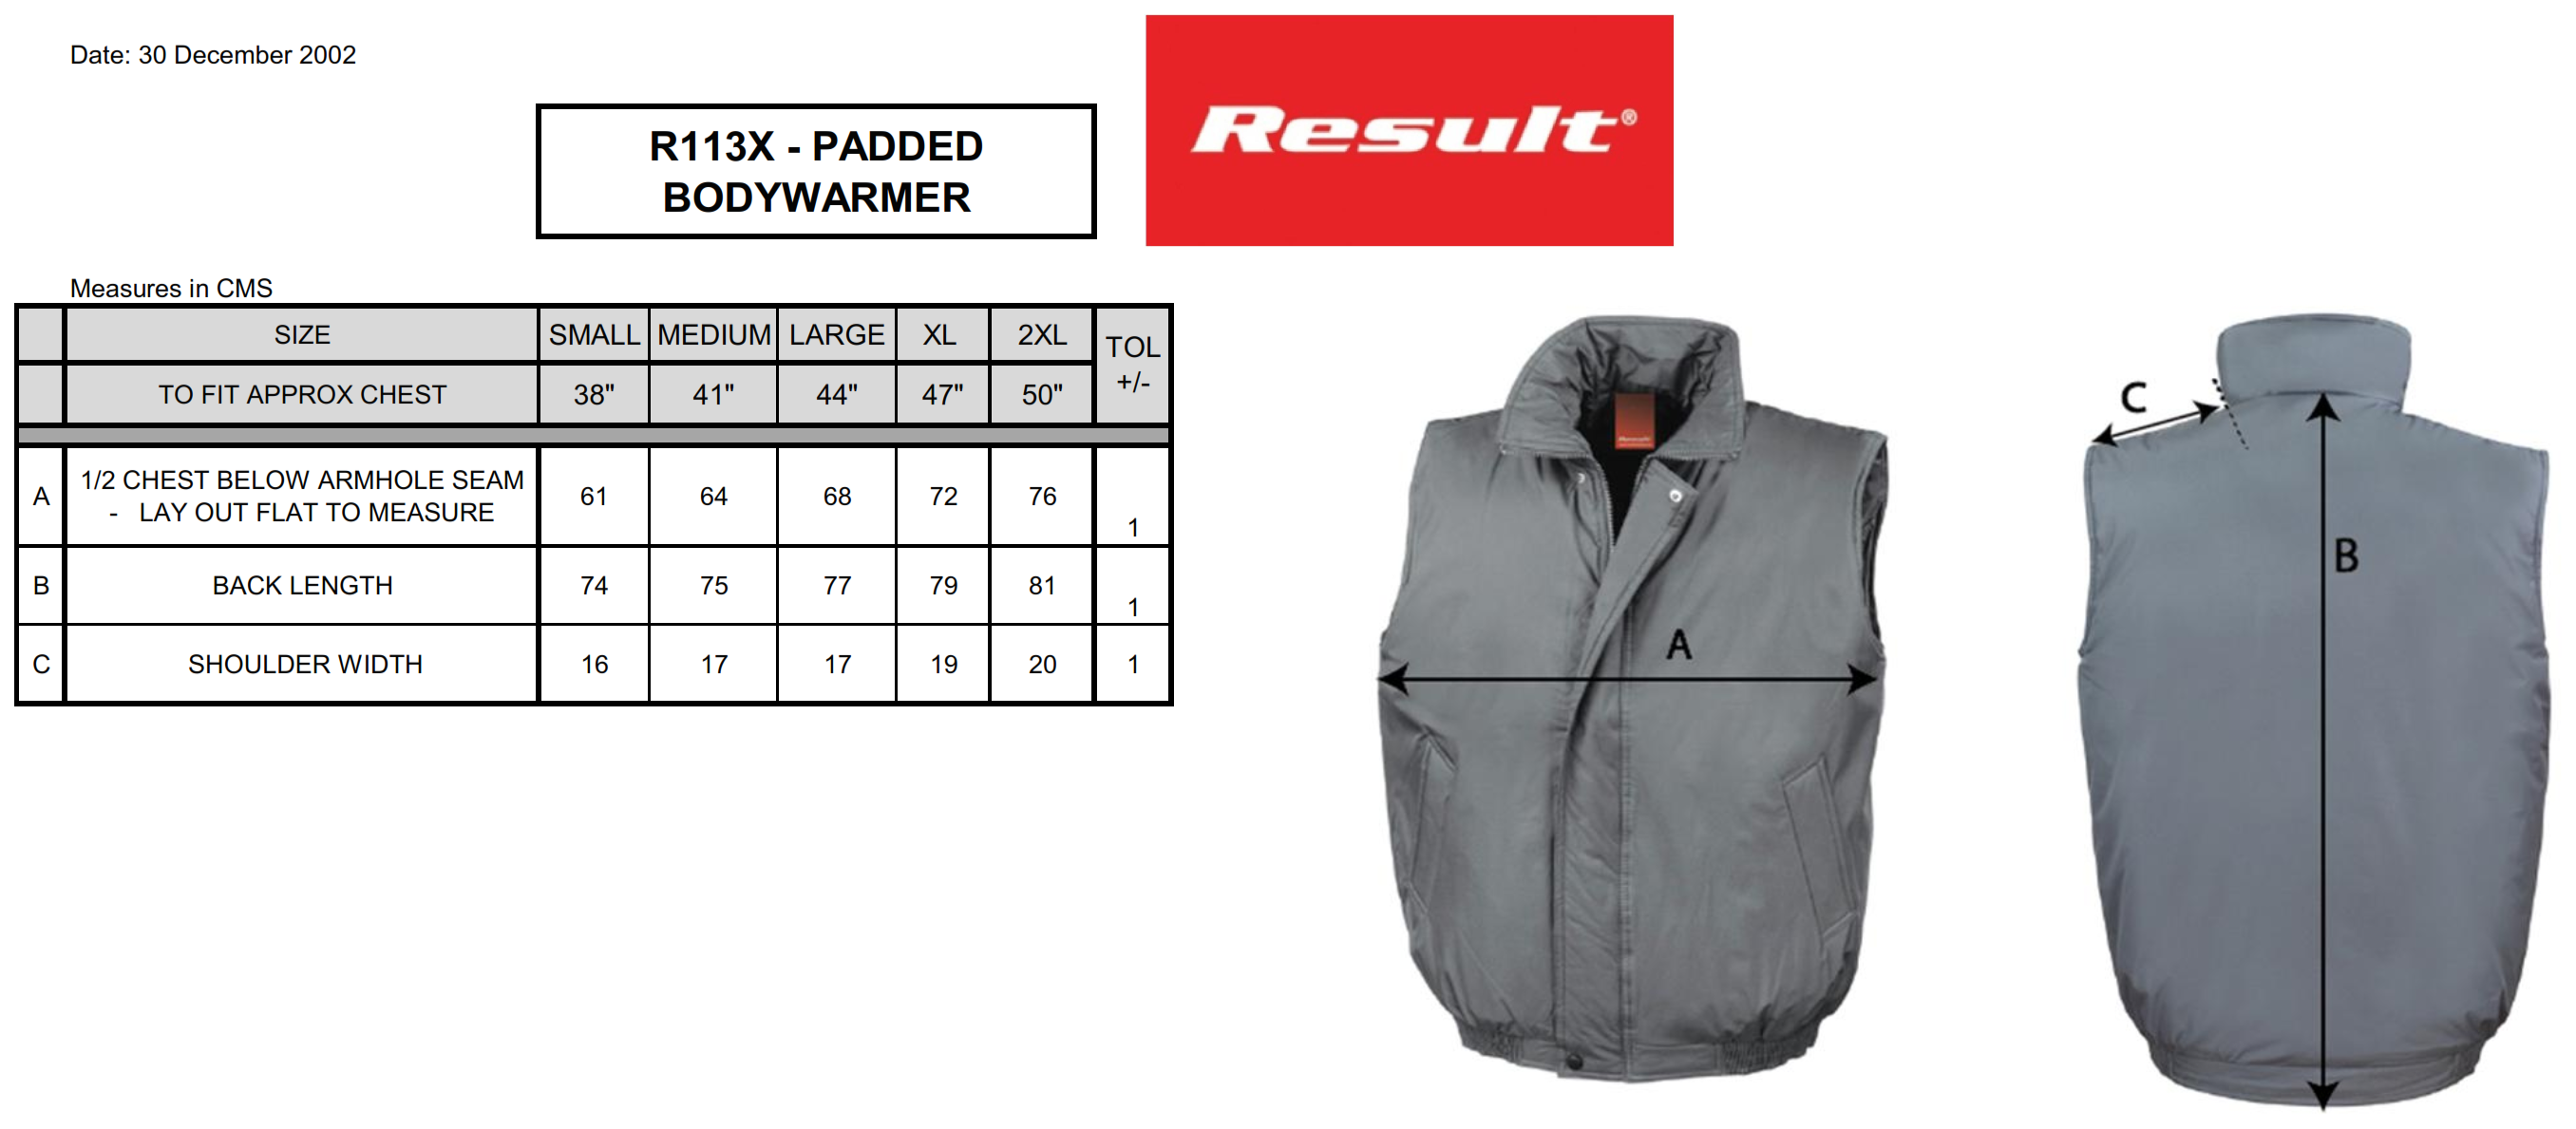 Result: Padded Bodywarmer R113X